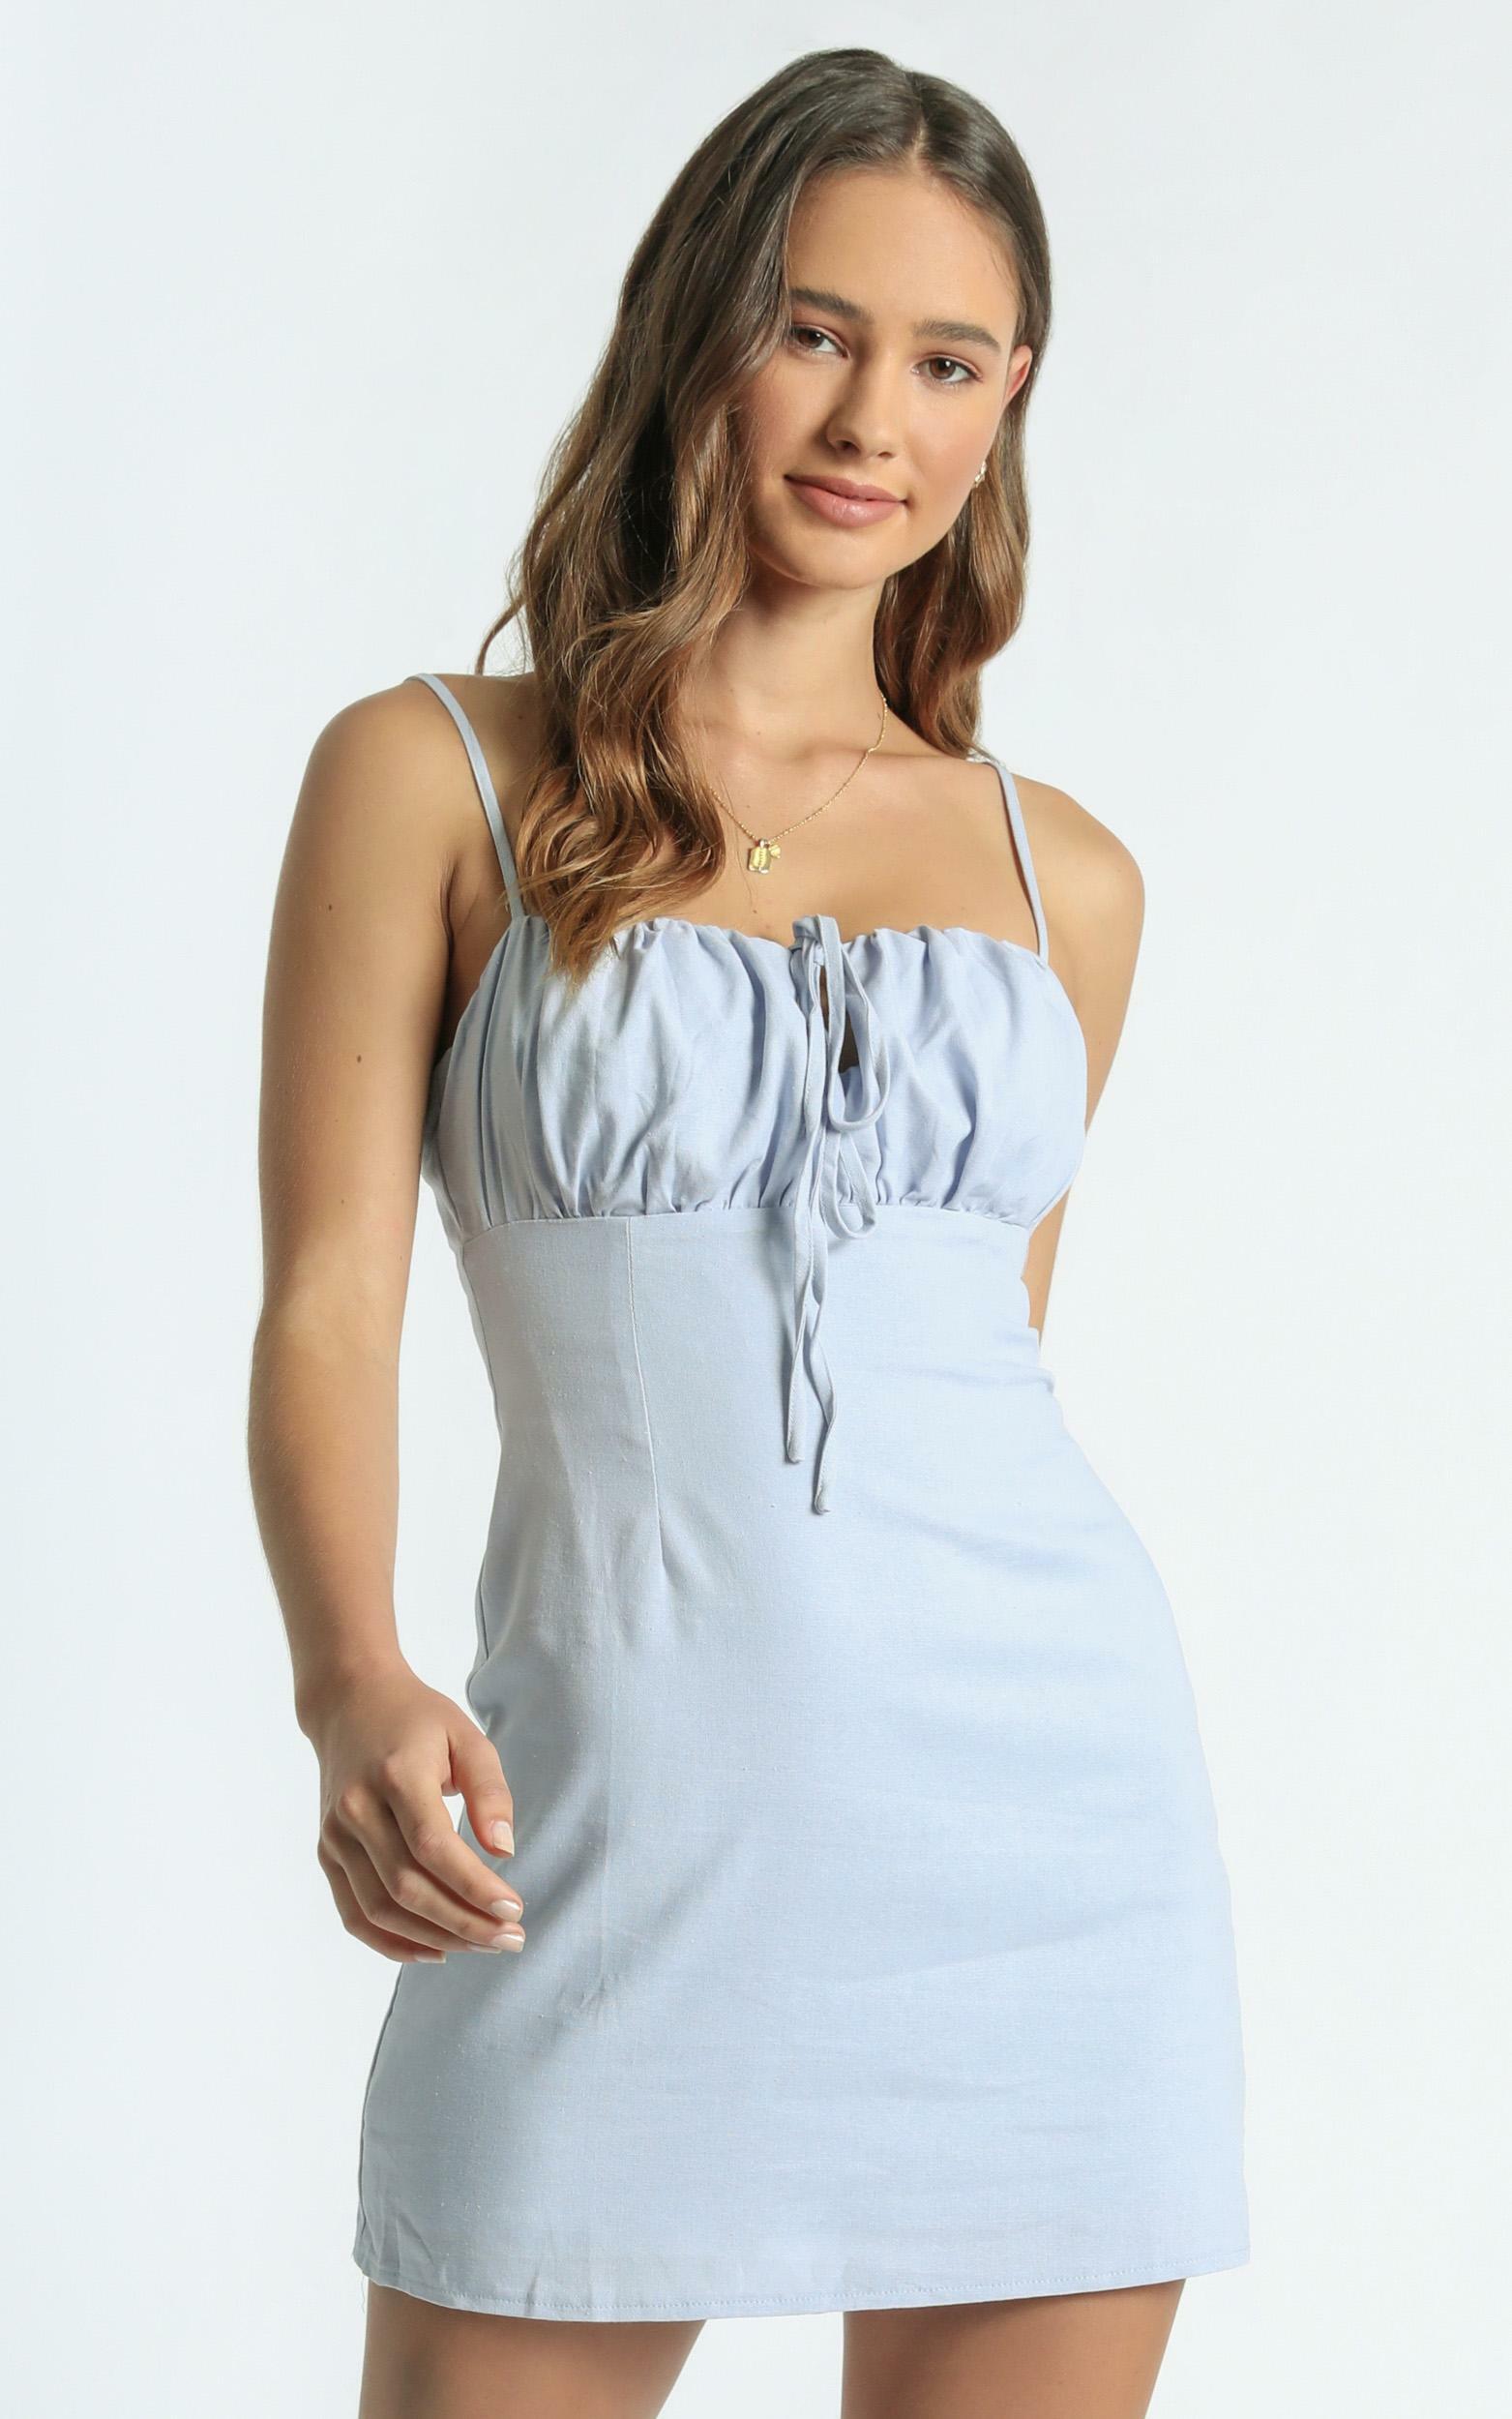 Break Free With Me Dress in Blue Linen Look - 10, BLU2, hi-res image number null